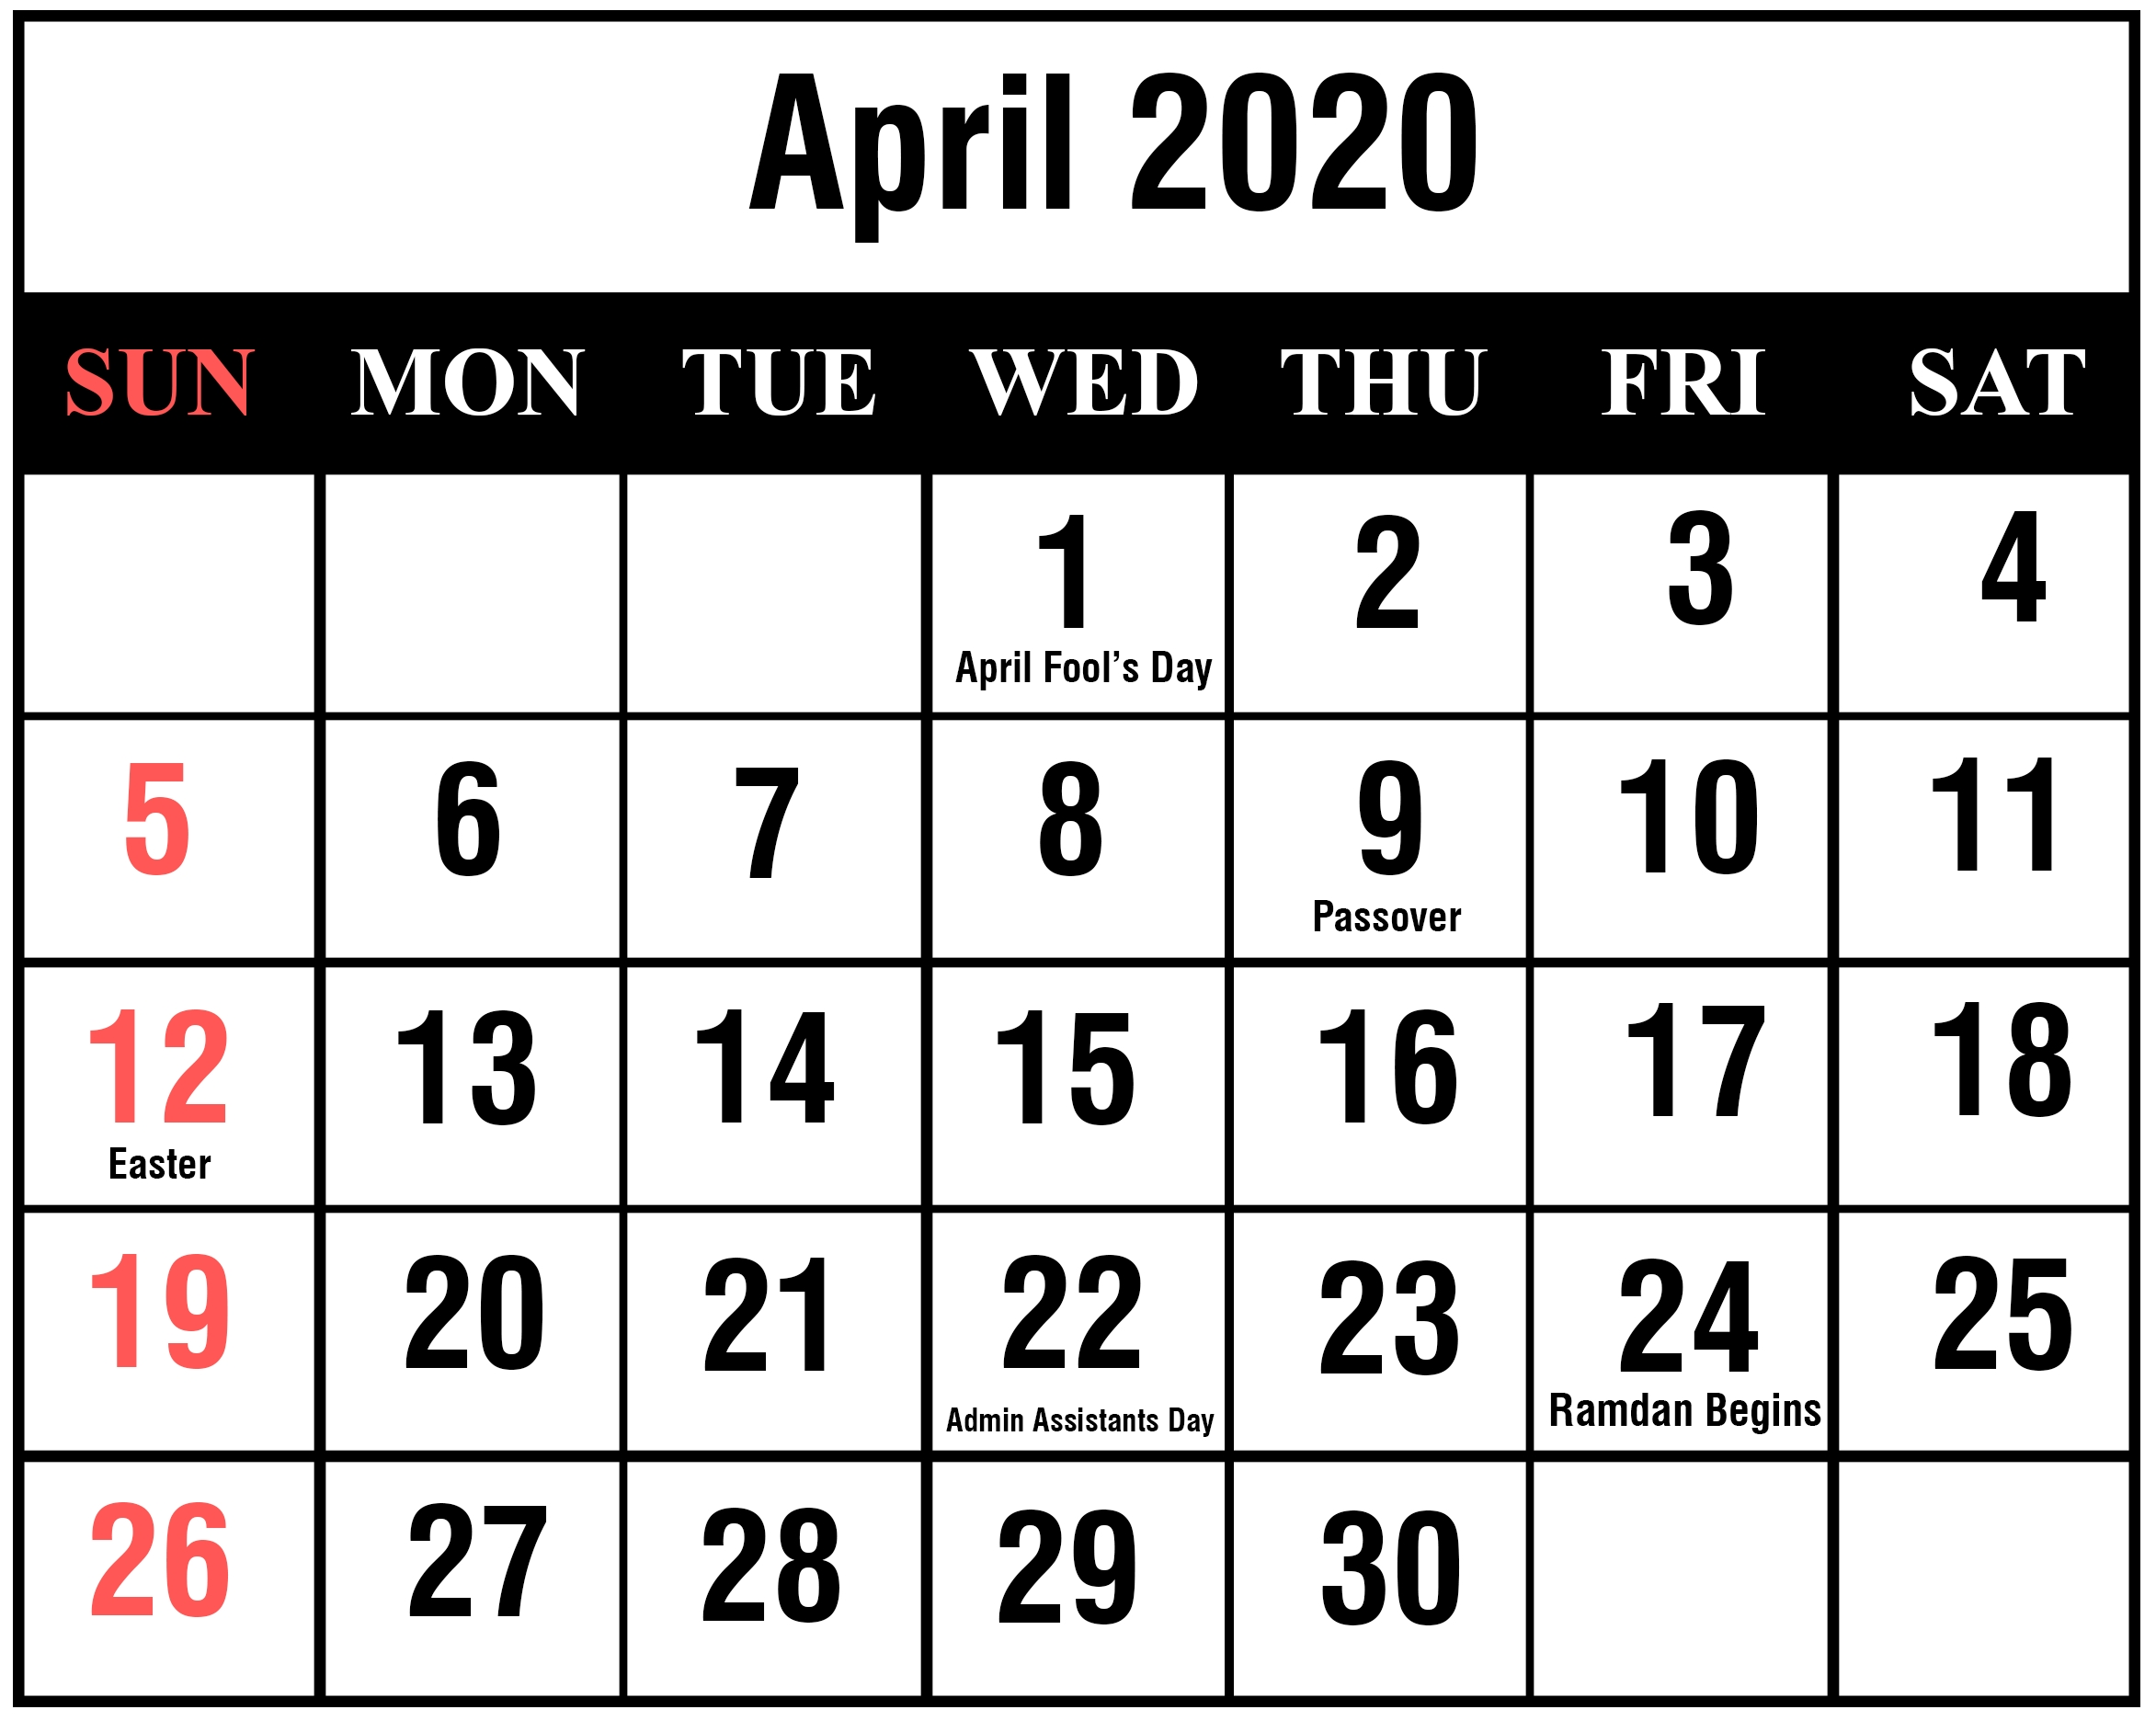 April 2020 Calendar Printable Template Blank Editable Word